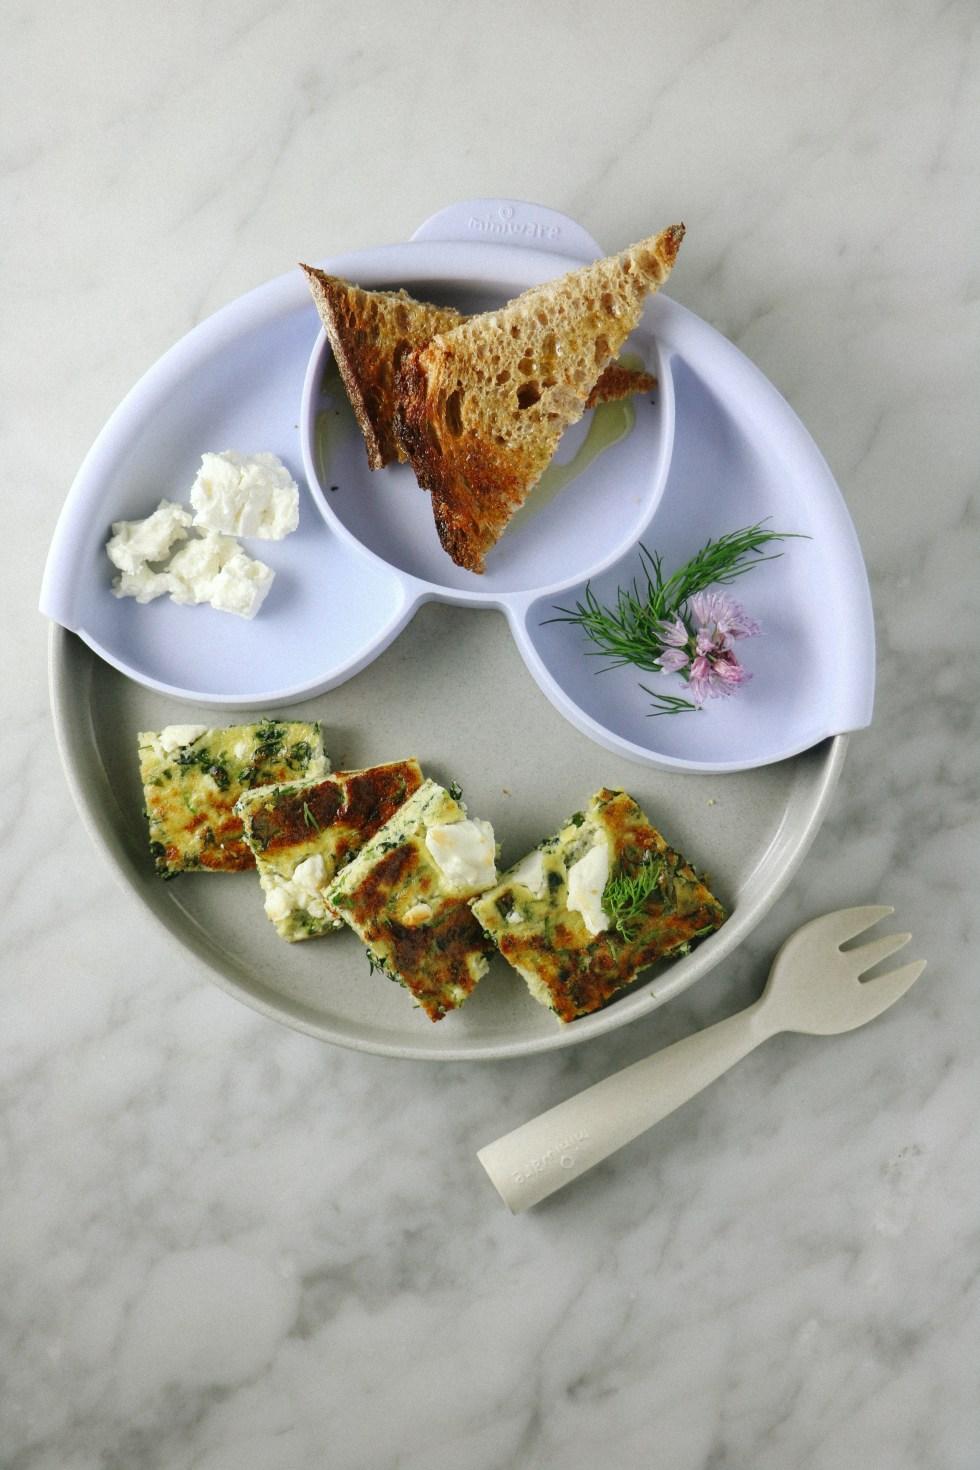 Herby Green Zucchini Frittata